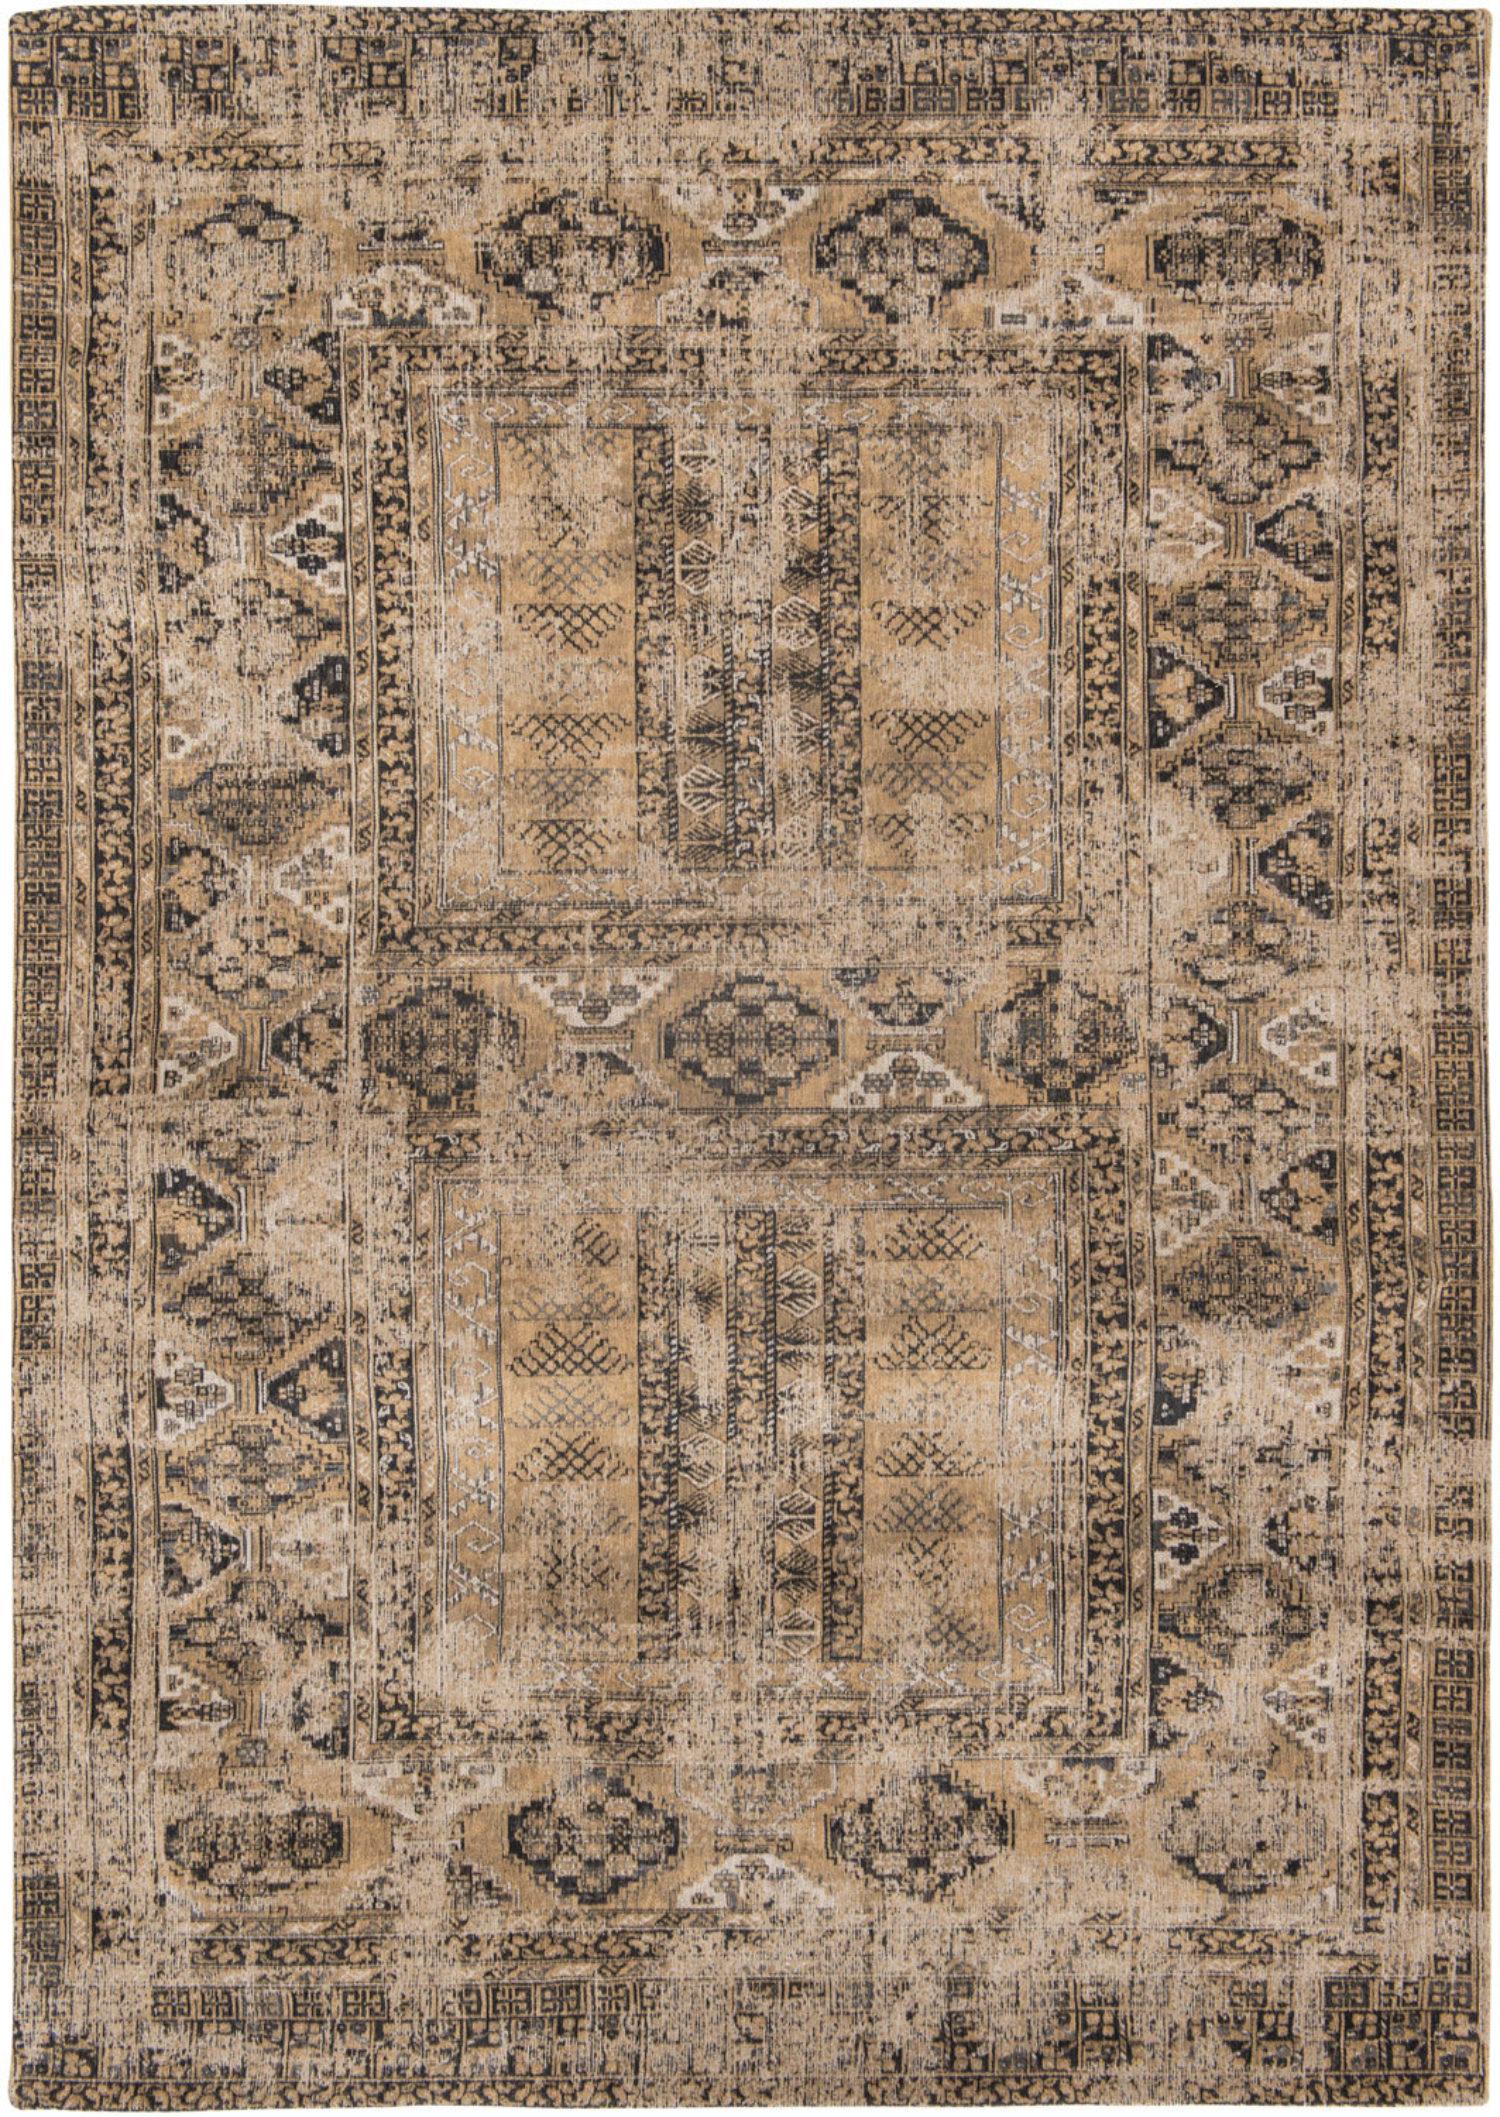 Antiquarian Antique Hadschlu - Aghaoldgold 8720